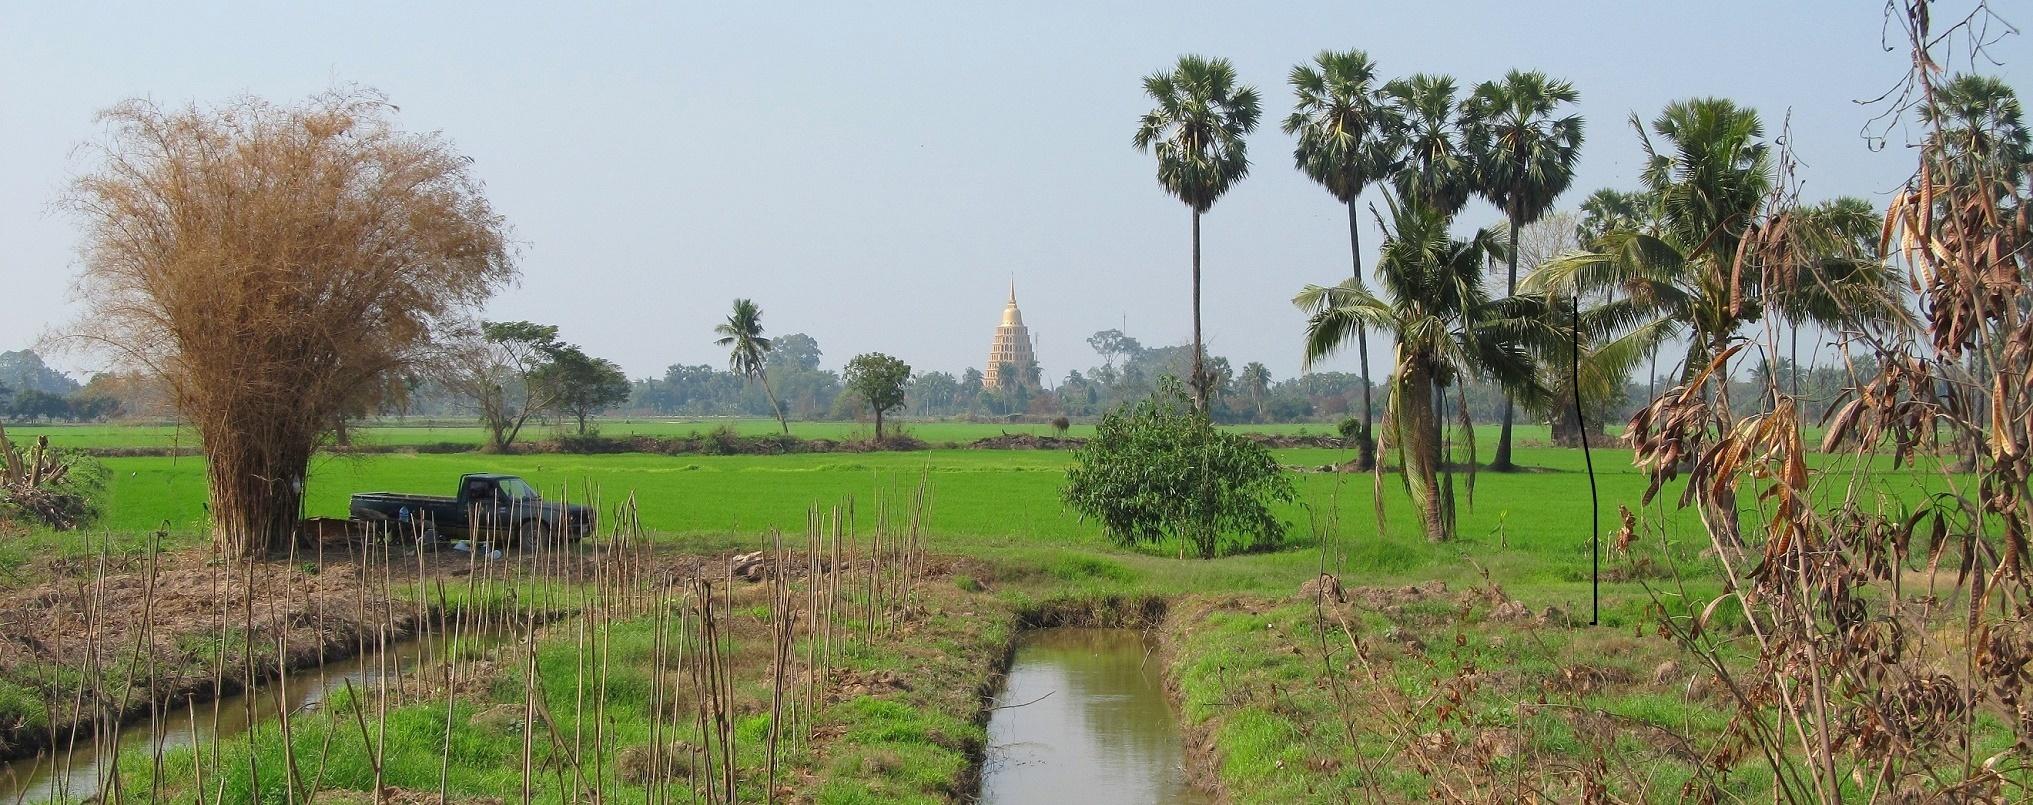 Wat Tha It v rýžovém poli - Thajsko